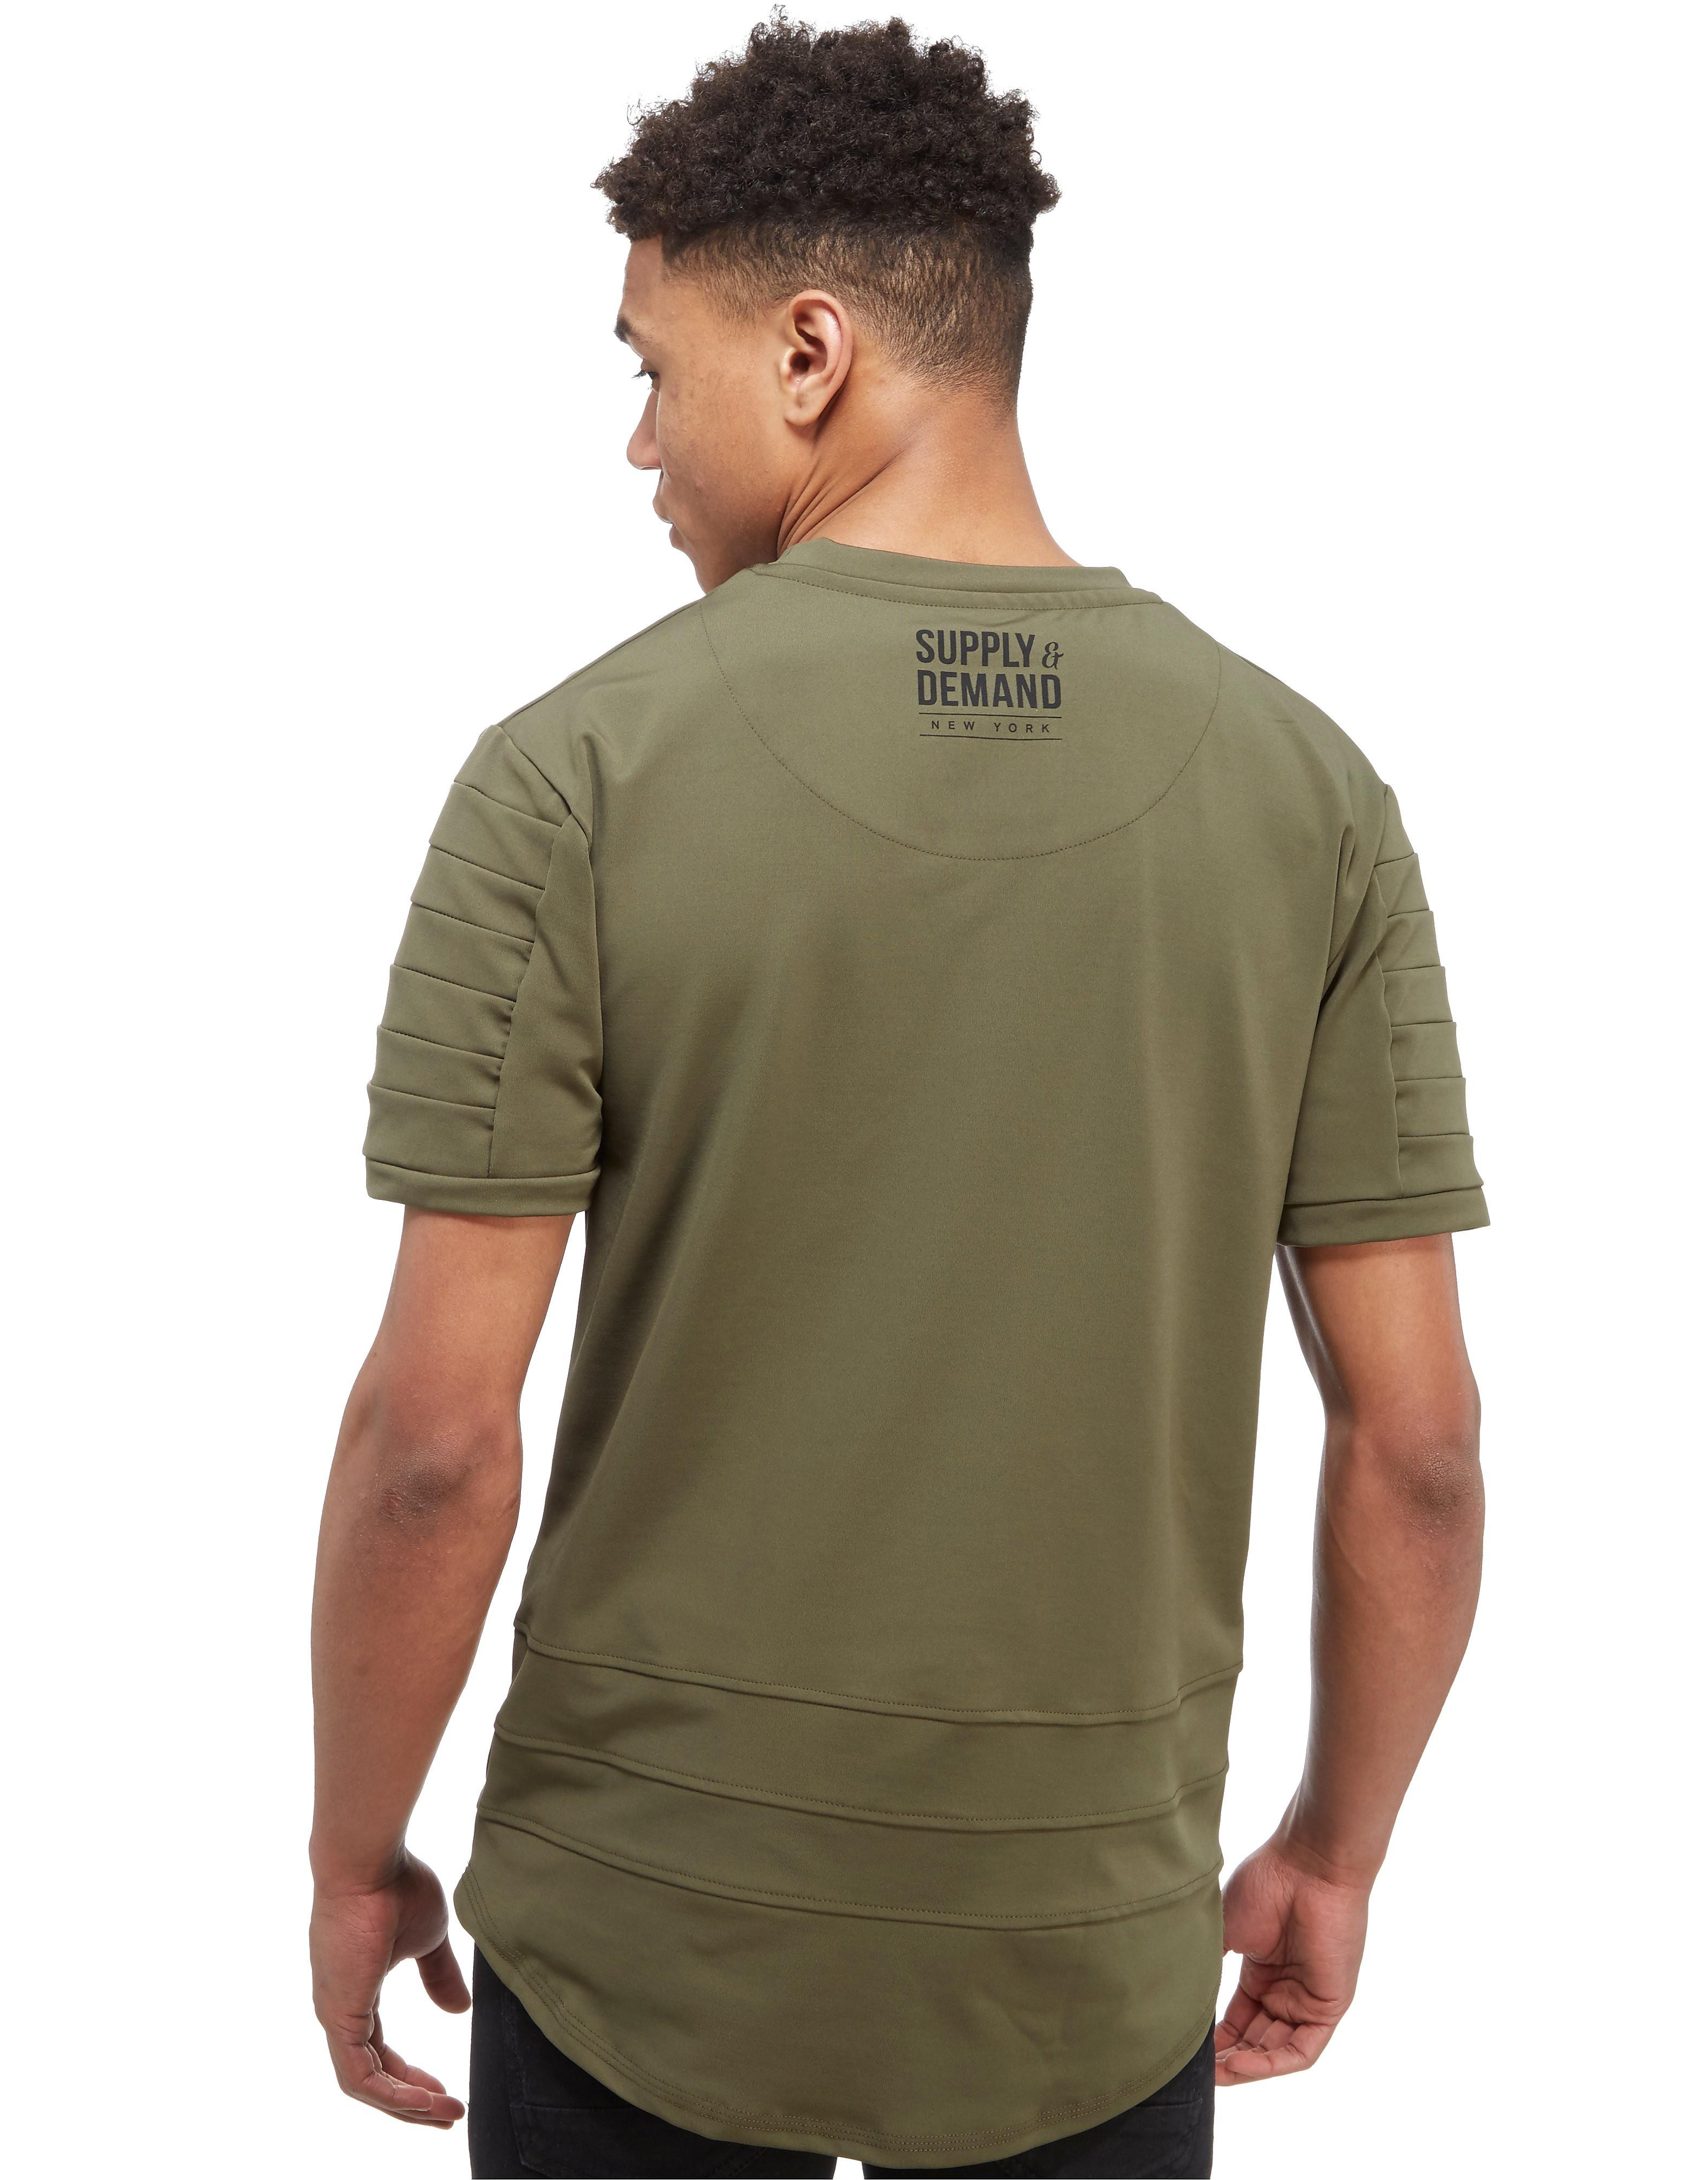 Supply & Demand Gothic Kings T-Shirt